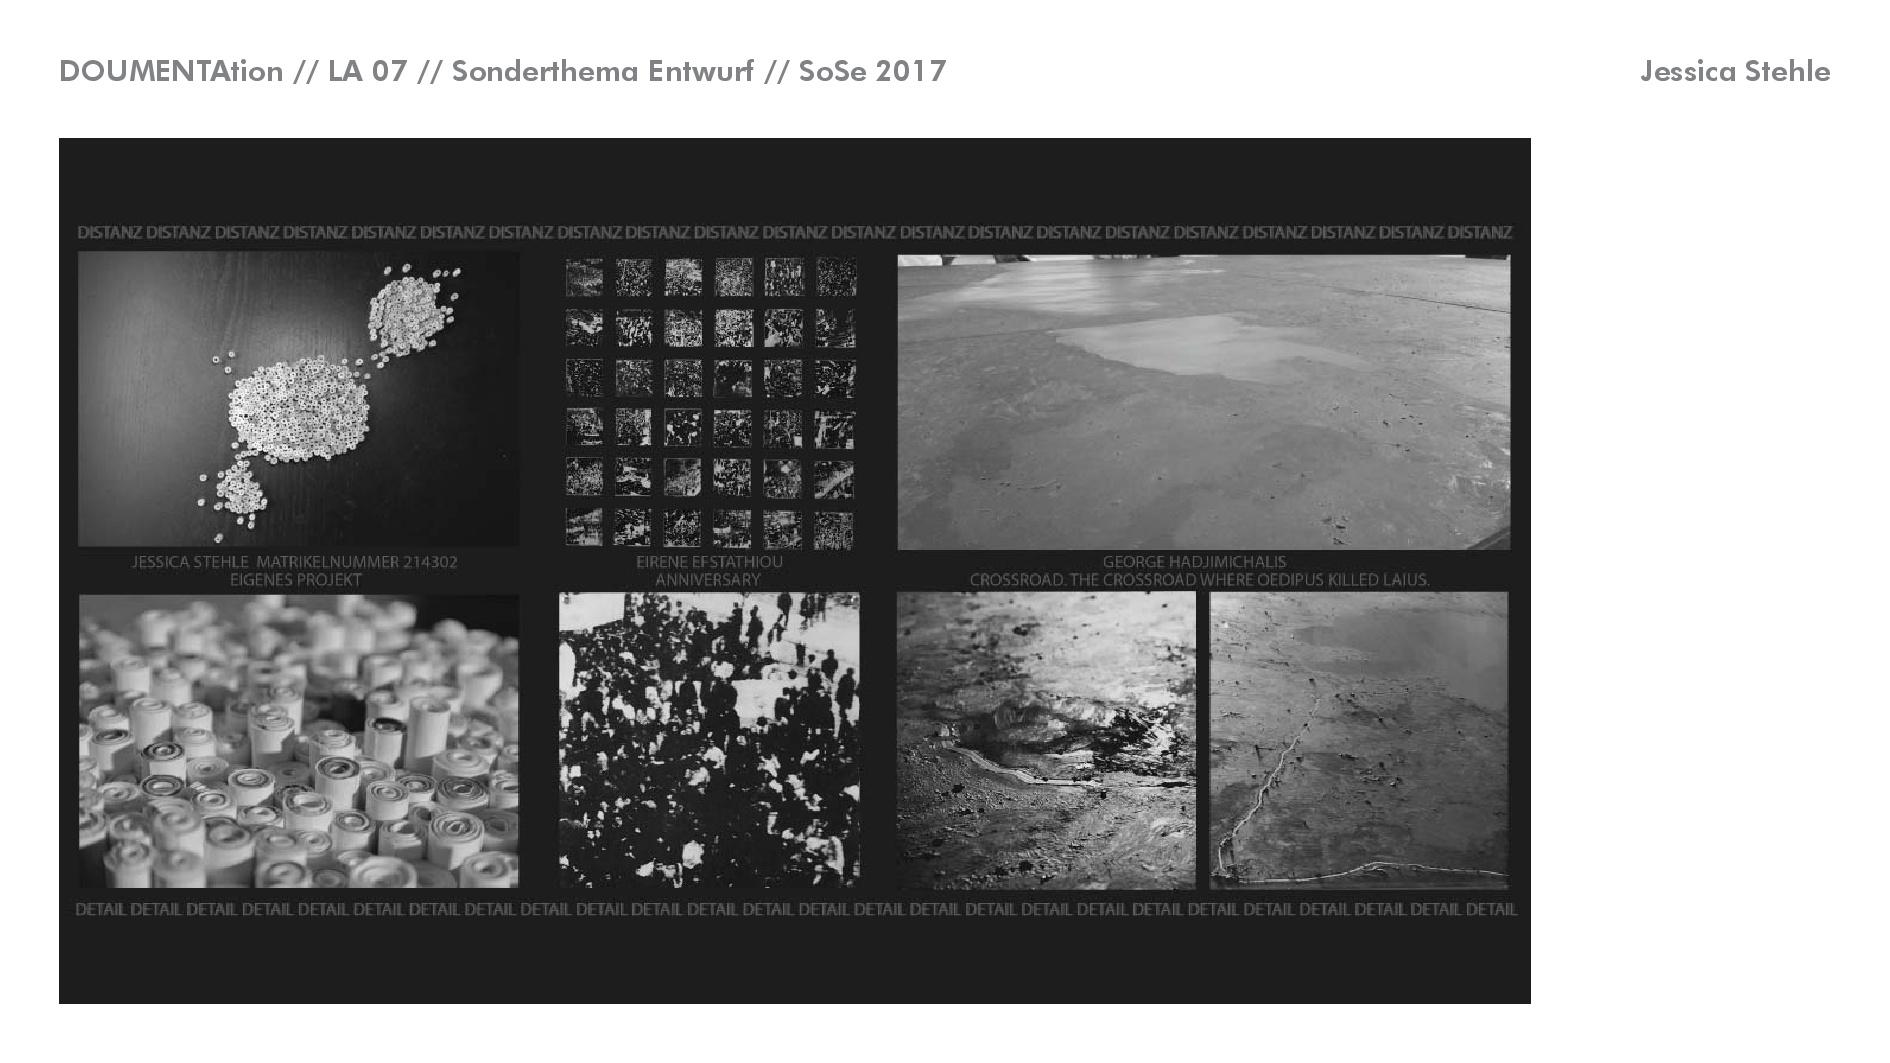 NEU Sonderthema Entwerfen SoSe 17 016